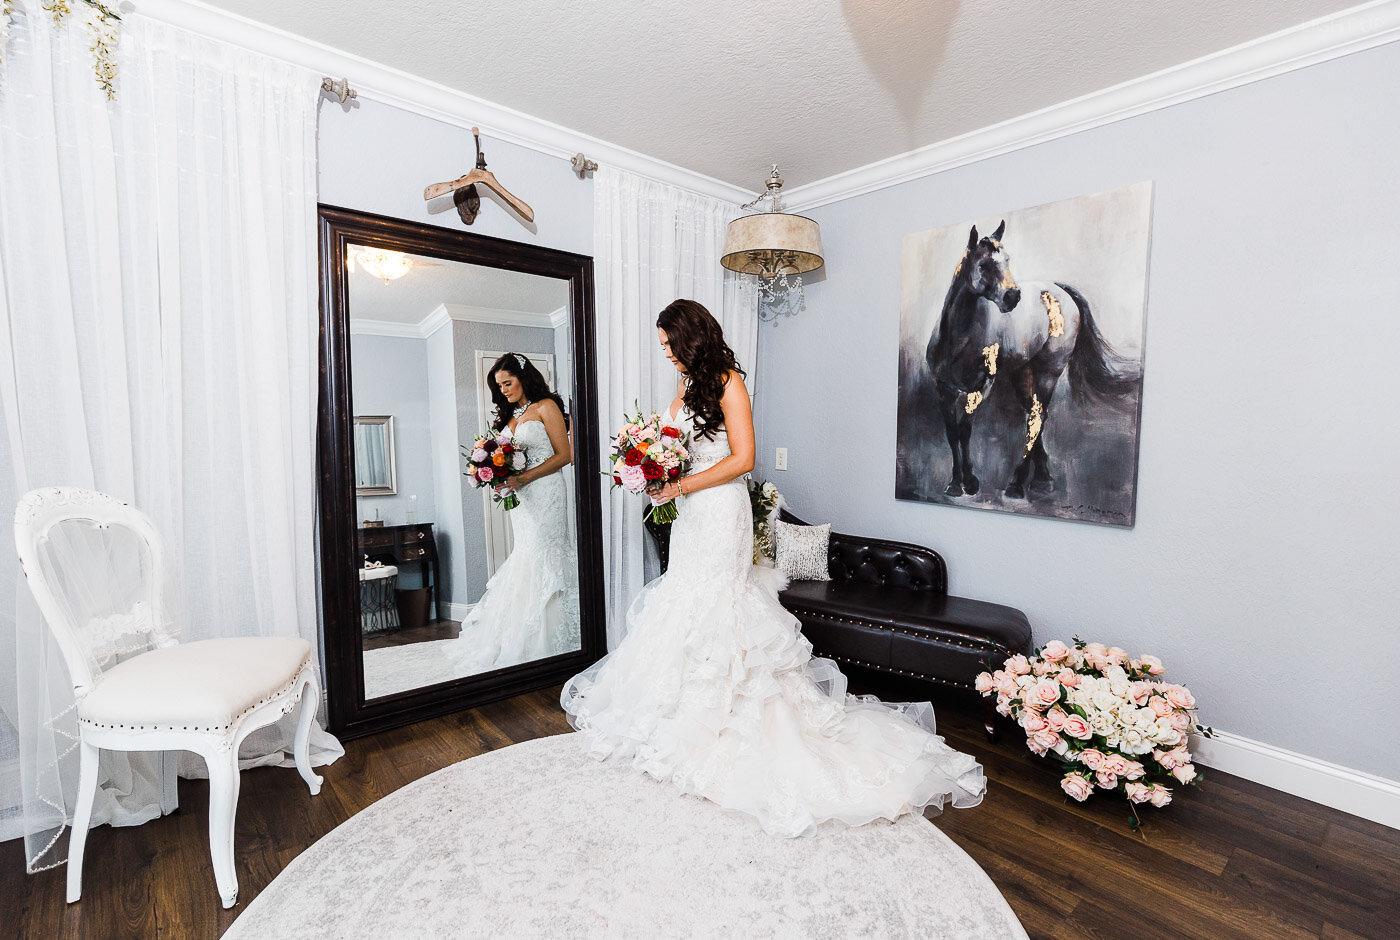 Lakeland-barn-wedding-at-white-horse-ranch-21.jpg